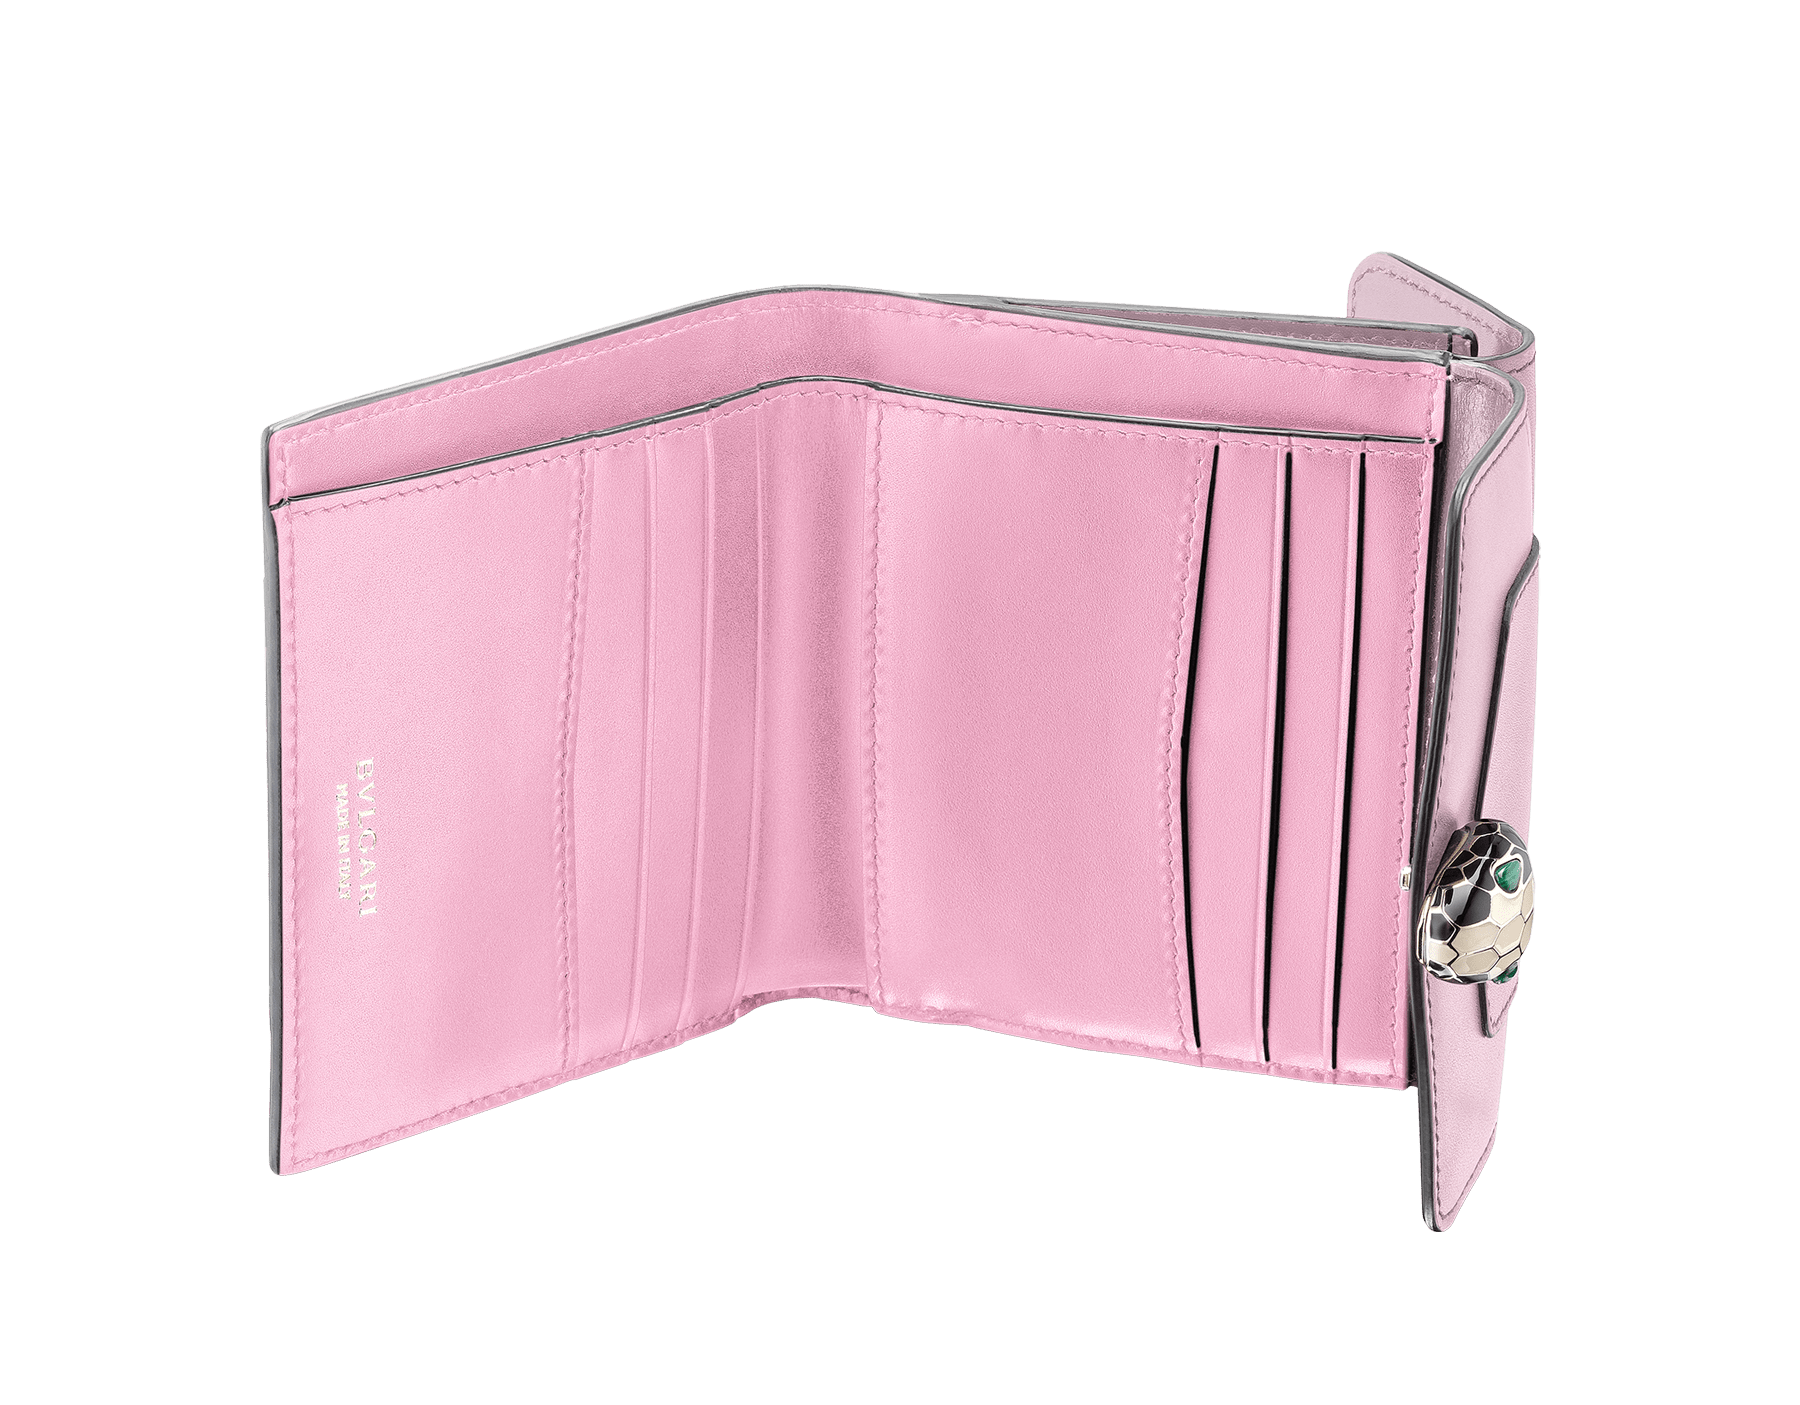 Serpenti Forever 方形小巧皮夾採用海星珊瑚色和粉紅尖晶石色小牛皮。經典蛇頭按扣飾以黑色和白色琺瑯,蛇眼鑲飾綠孔雀石。 SEA-WLT-COMPACT-3Fb image 2